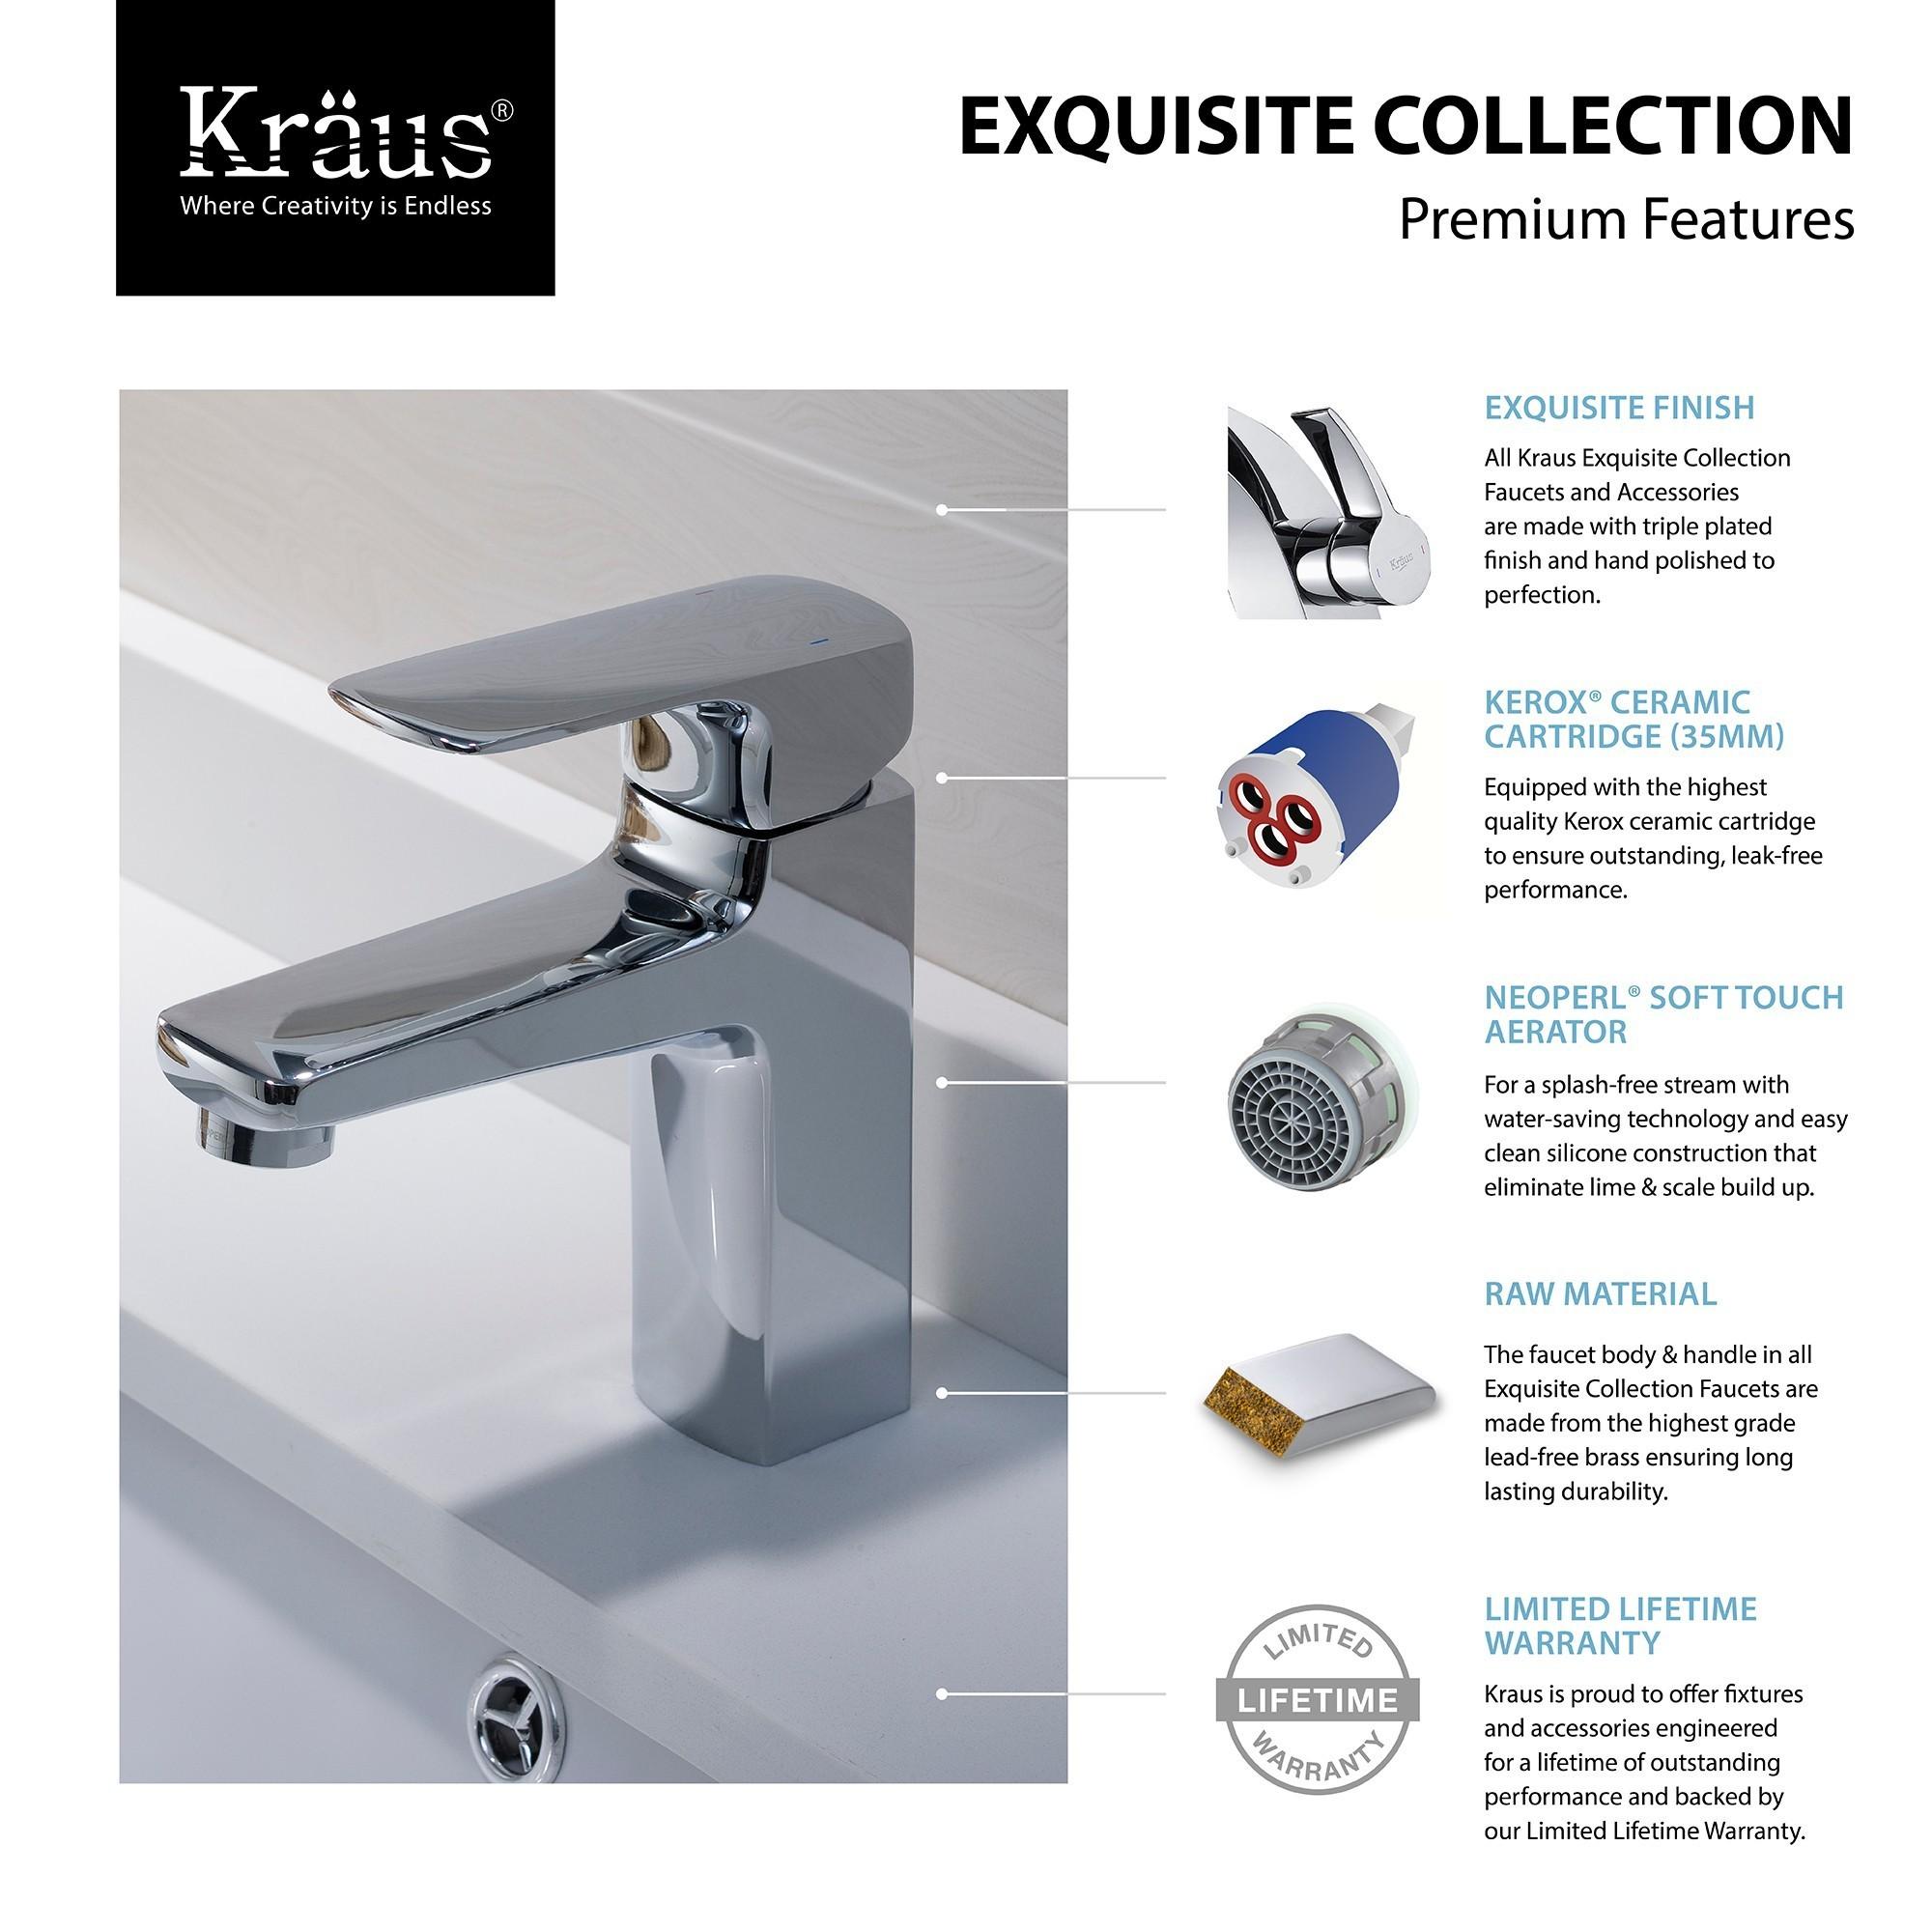 water efficient kitchen faucet corian countertops terrific bathroom sink aerator gallery design ideas latest picture photo